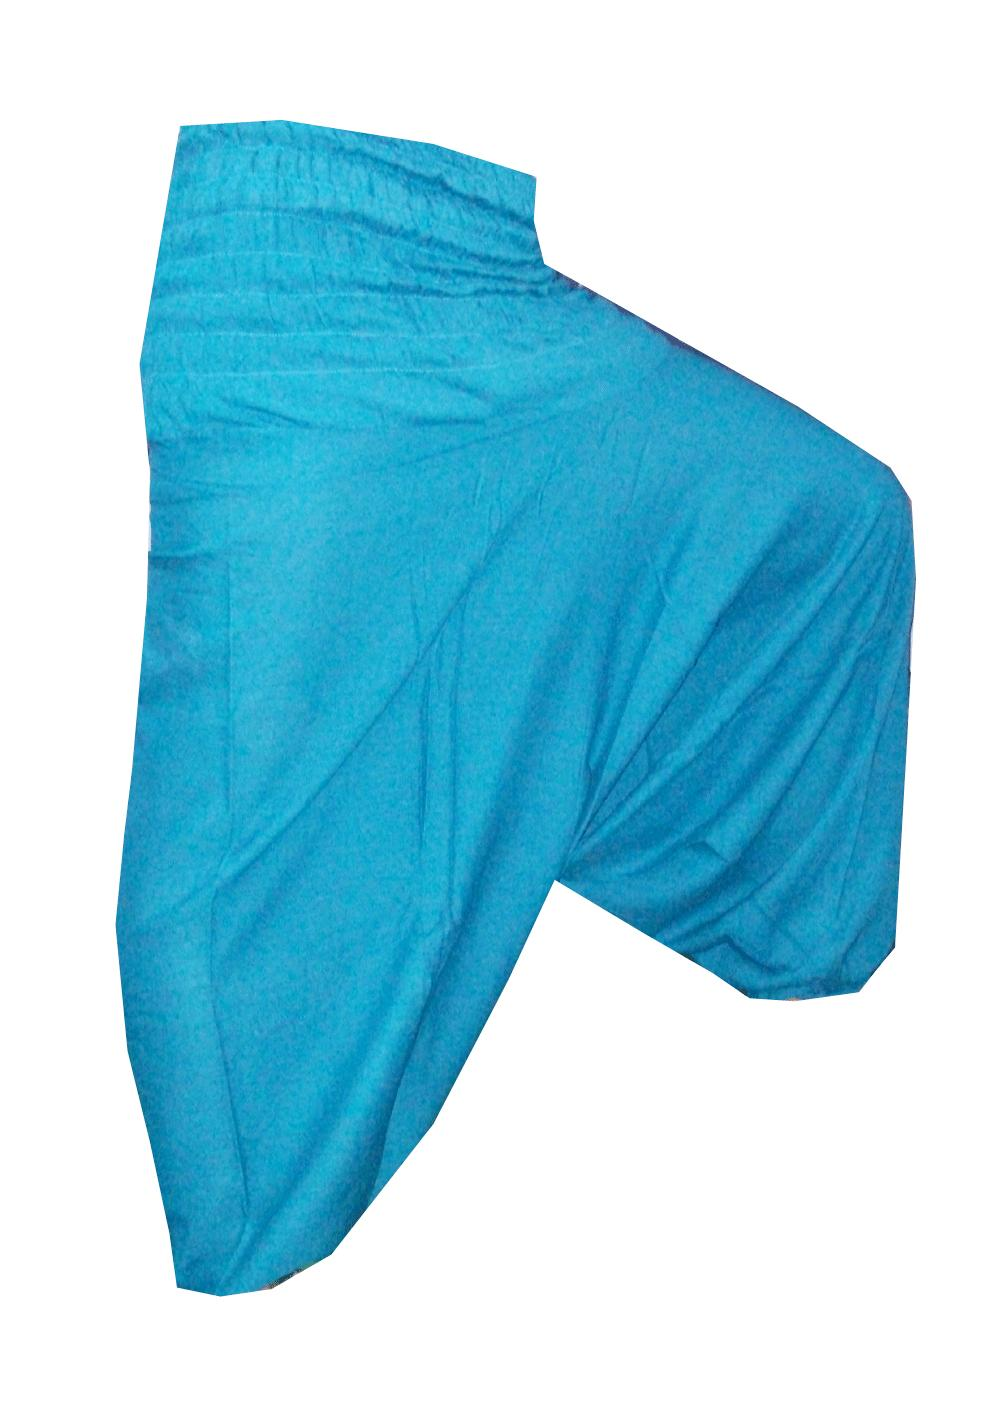 Ali Baba Harem Trousers Pants Aladdin Afghan Genie Hippy Yog